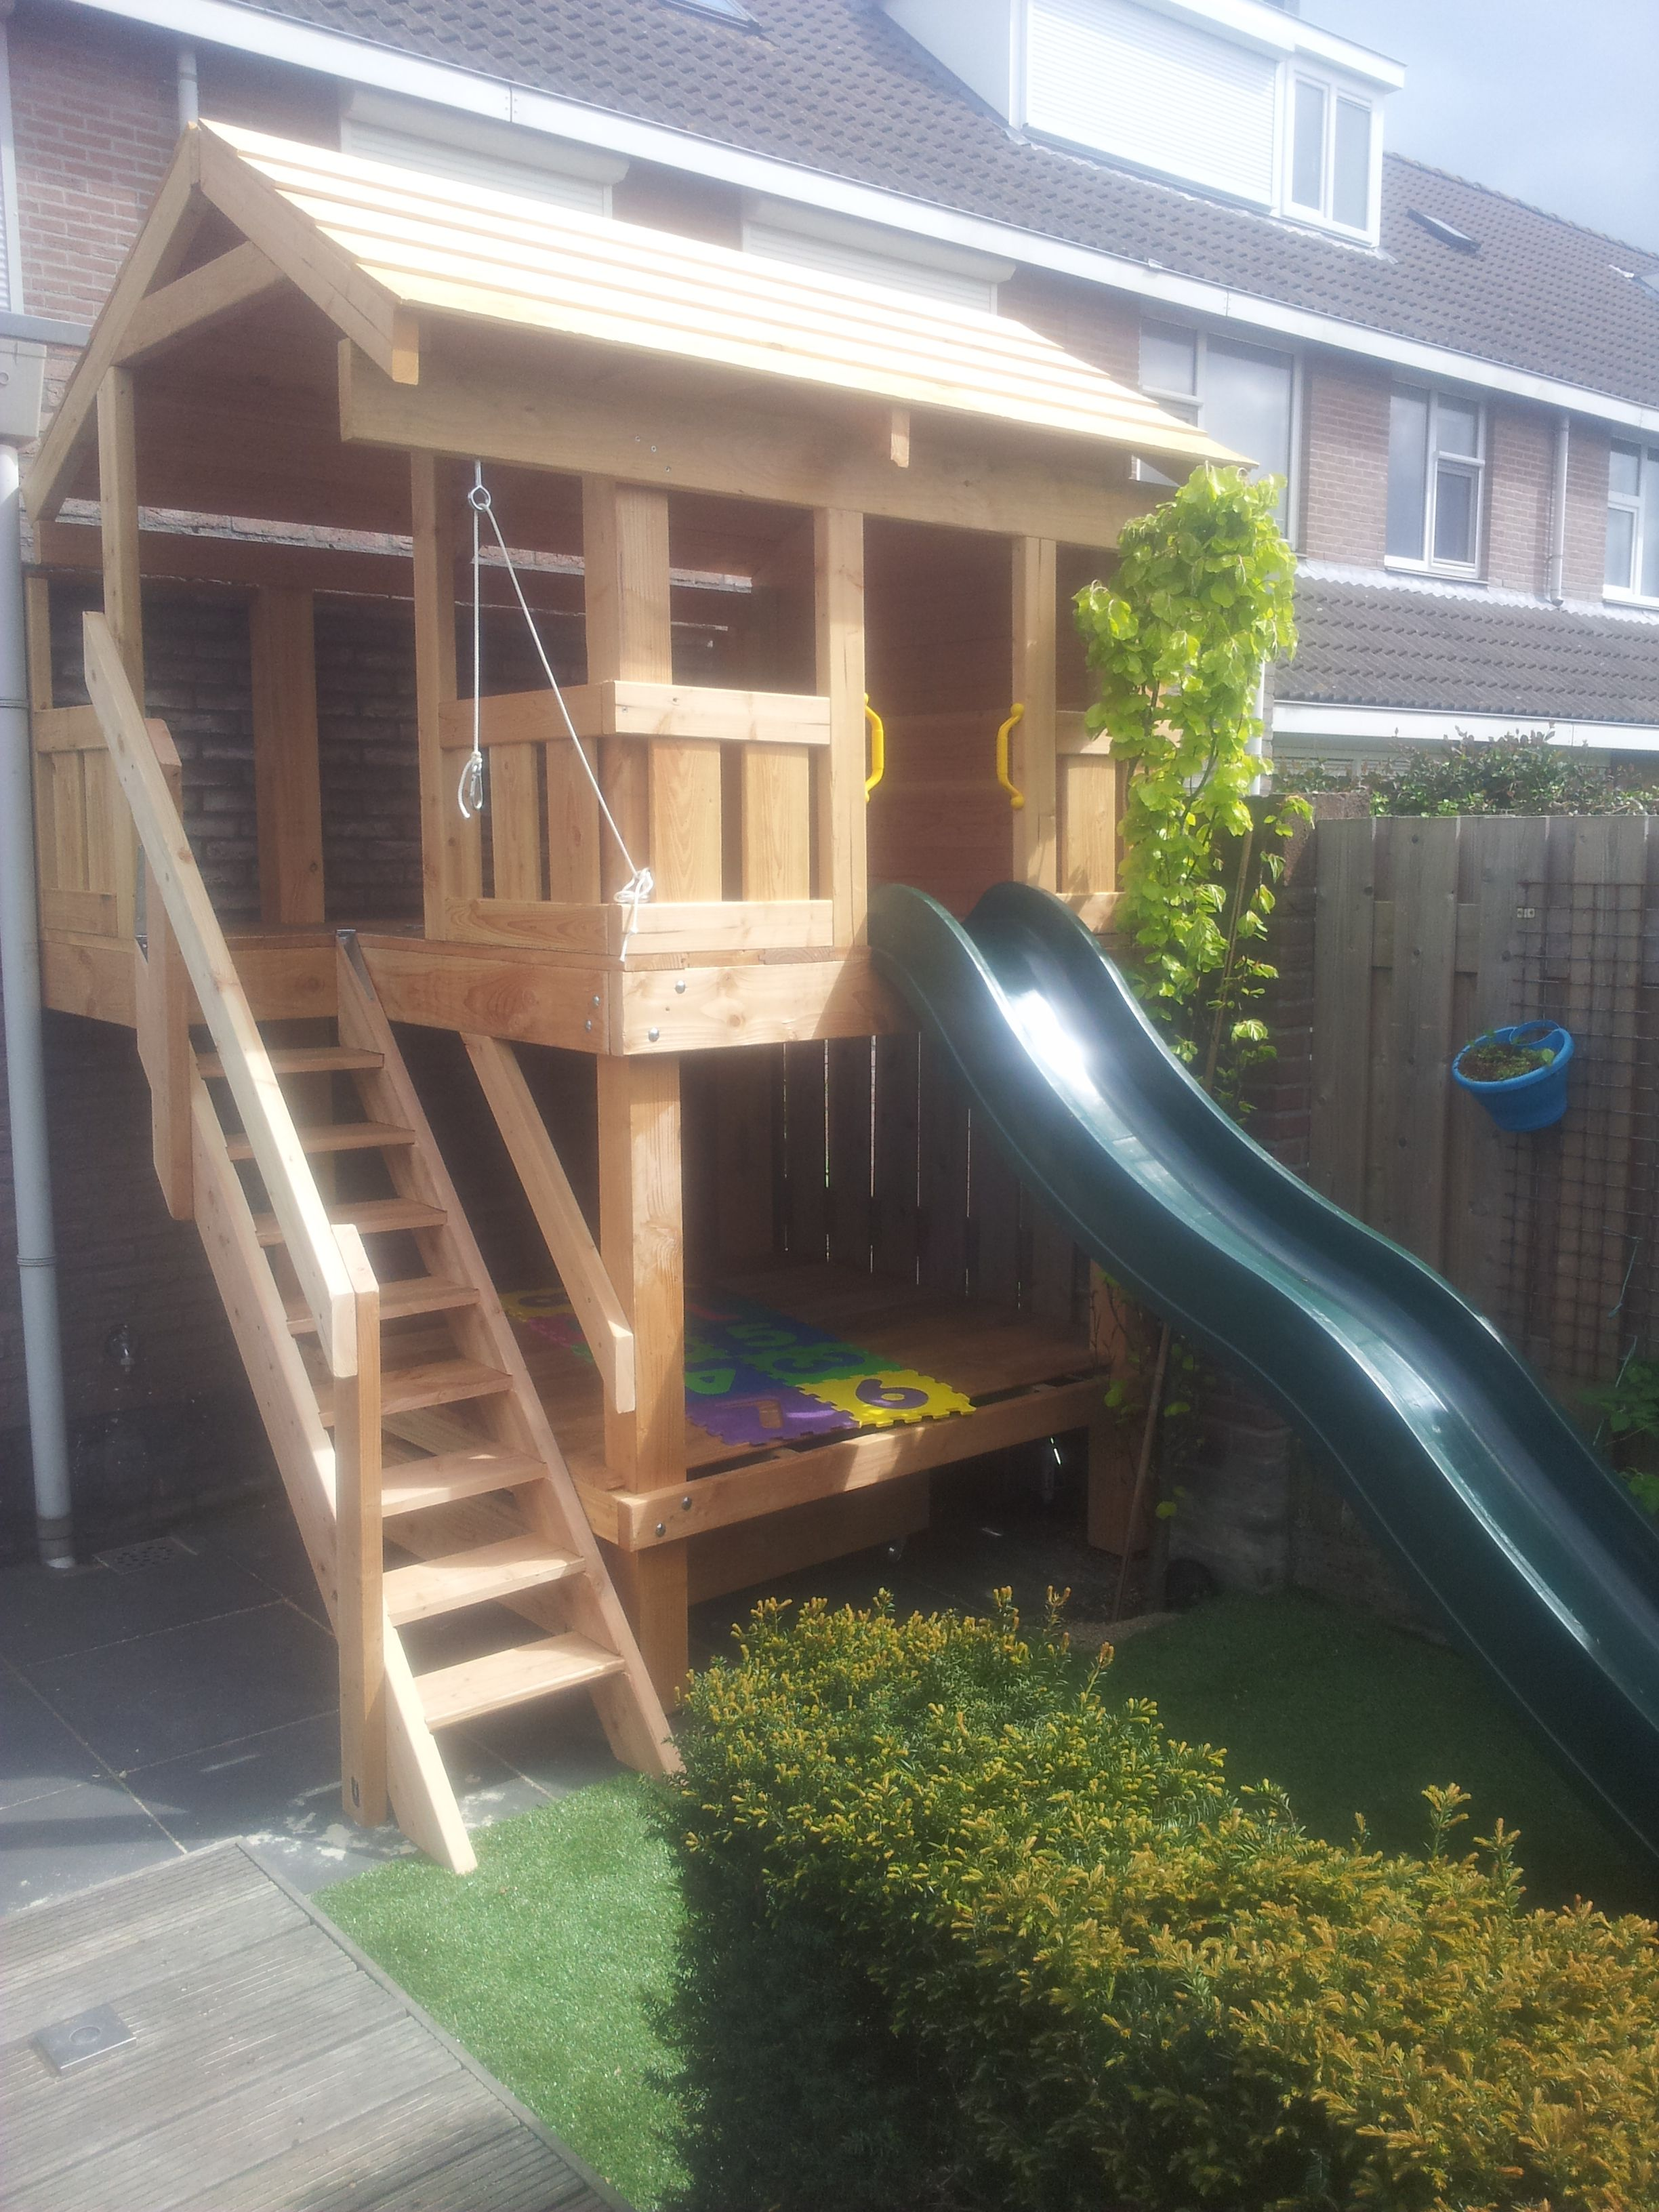 Construction Cabane Enfant dedans Épinglé par kyra mitchell sur gardening and backyard fun | pinterest